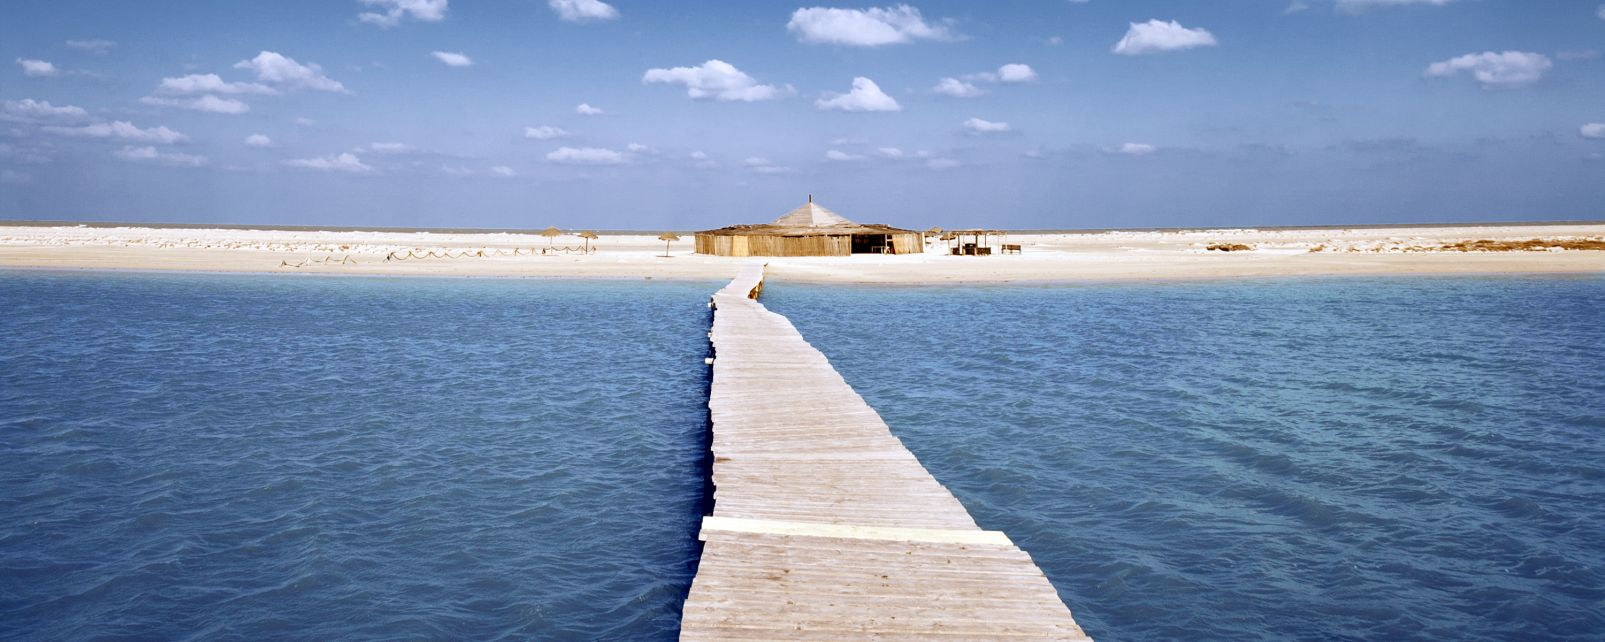 Afrique; Tunisie; Djerba;